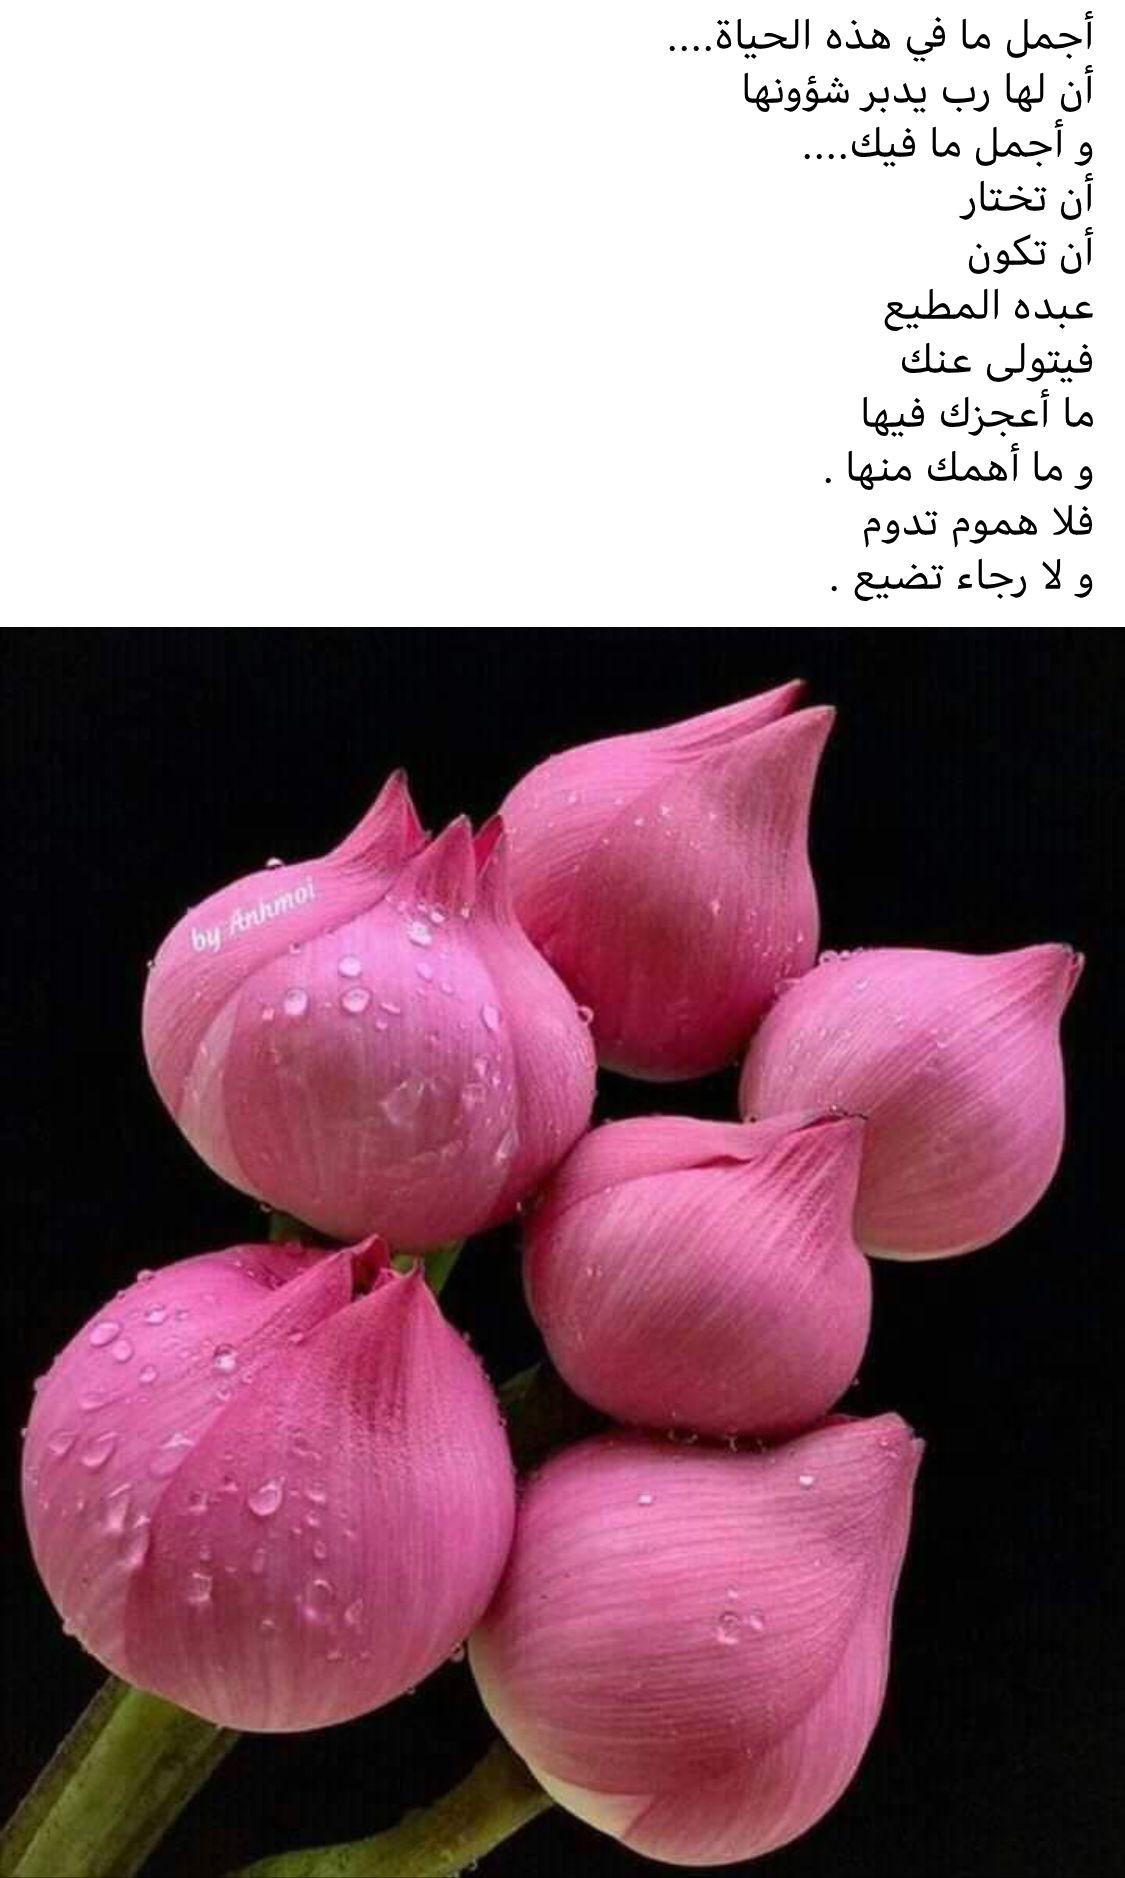 Pin By Wallaa Abbas On مواعظ خواطر إسلامية Arabic Typing Trust God Arabic Quotes